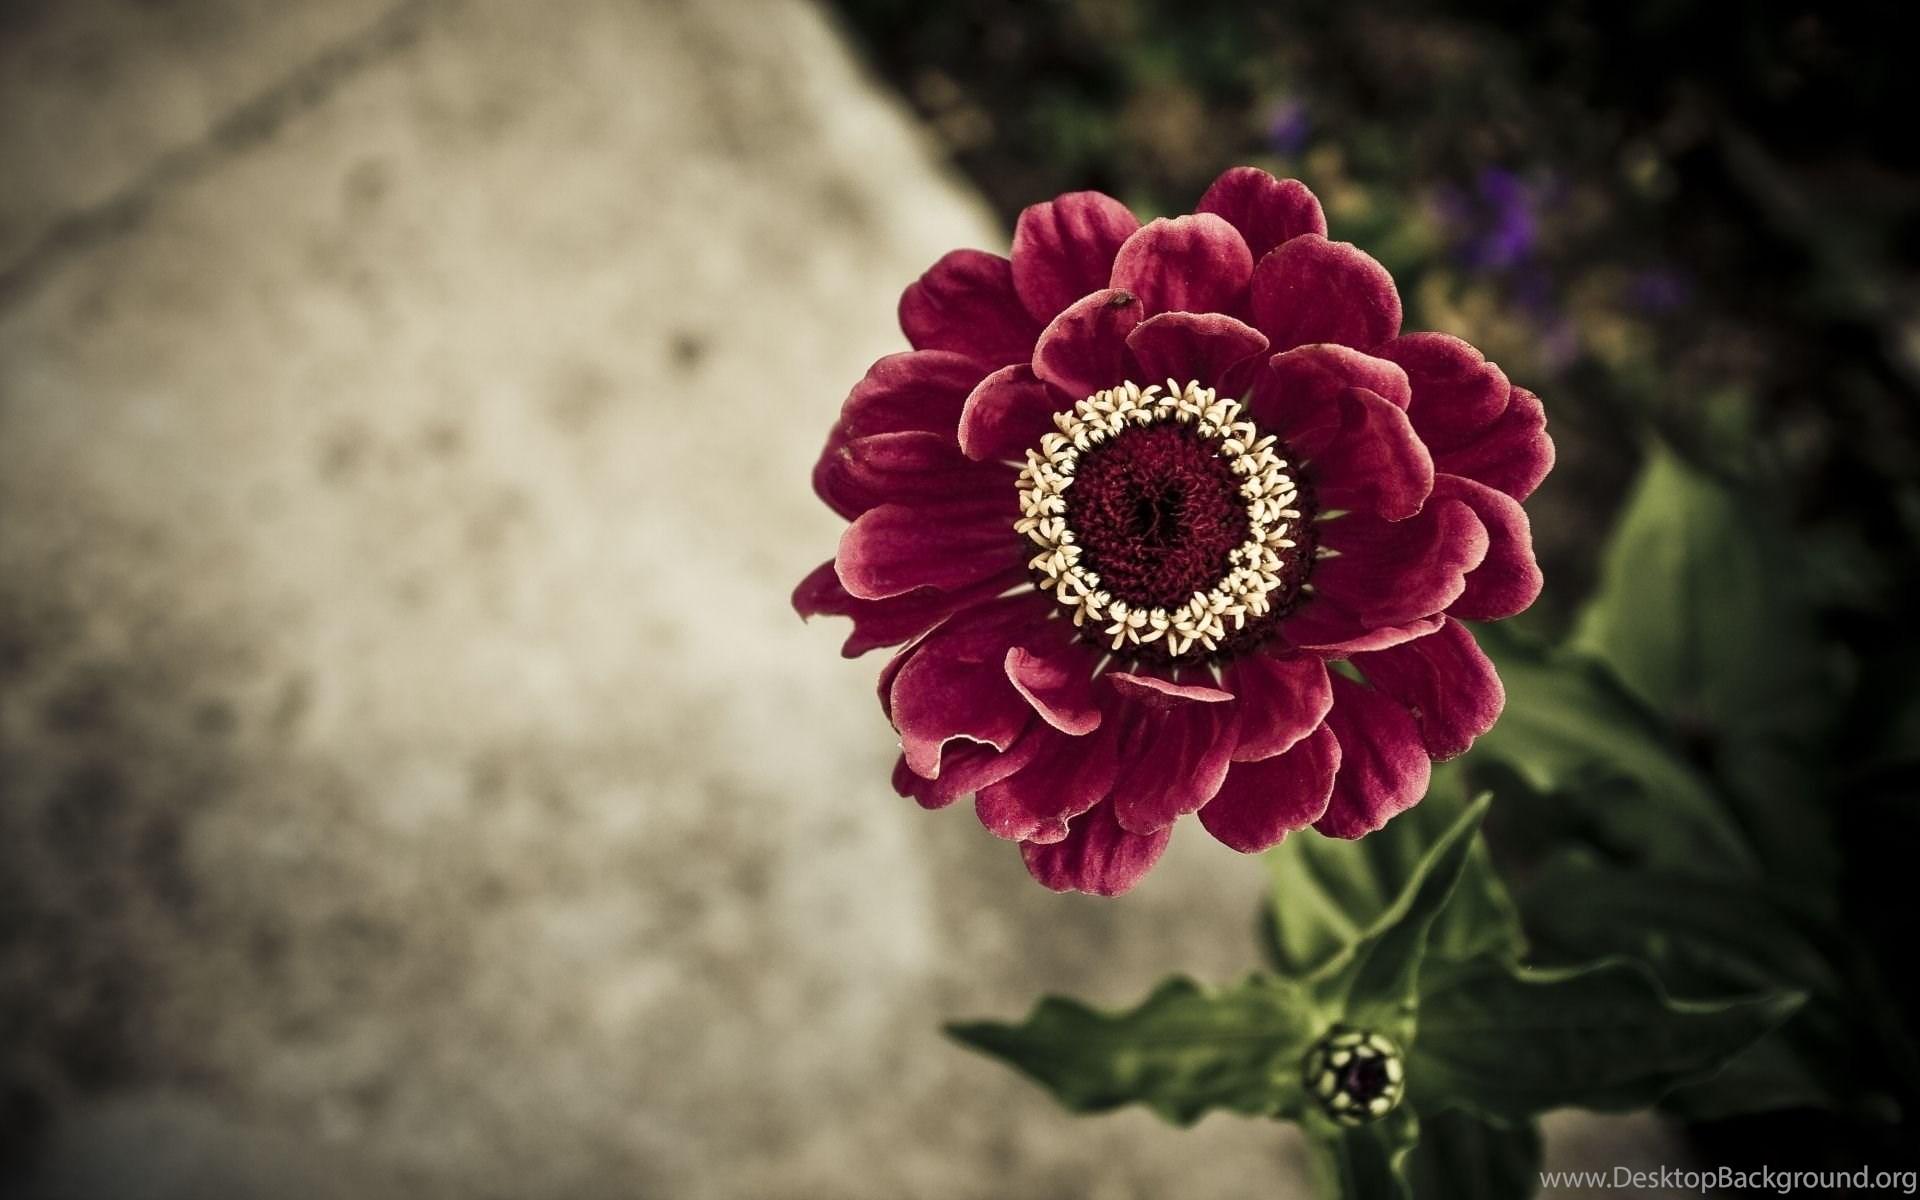 Most beautiful flowers images download desktop background original size 196kb izmirmasajfo